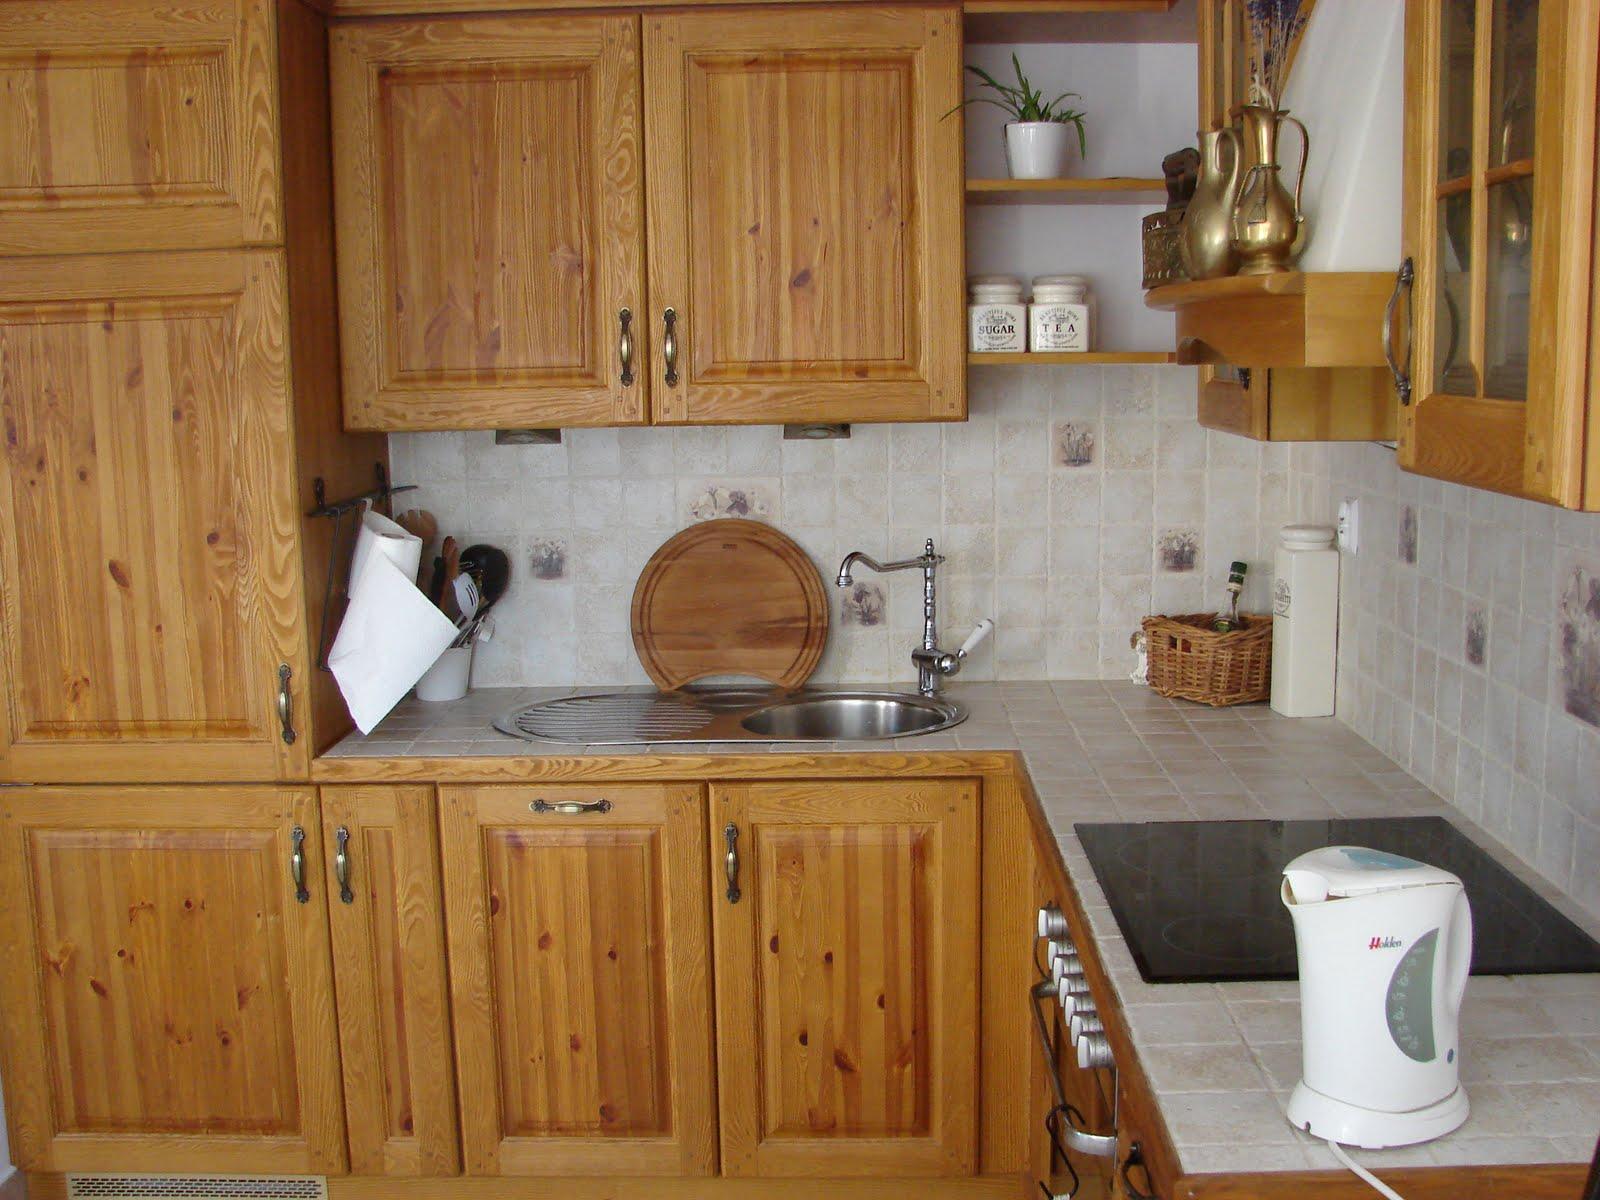 Home Harmony Kuchnia rustykalna -> Kuchnia Nowoczesno Rustykalna